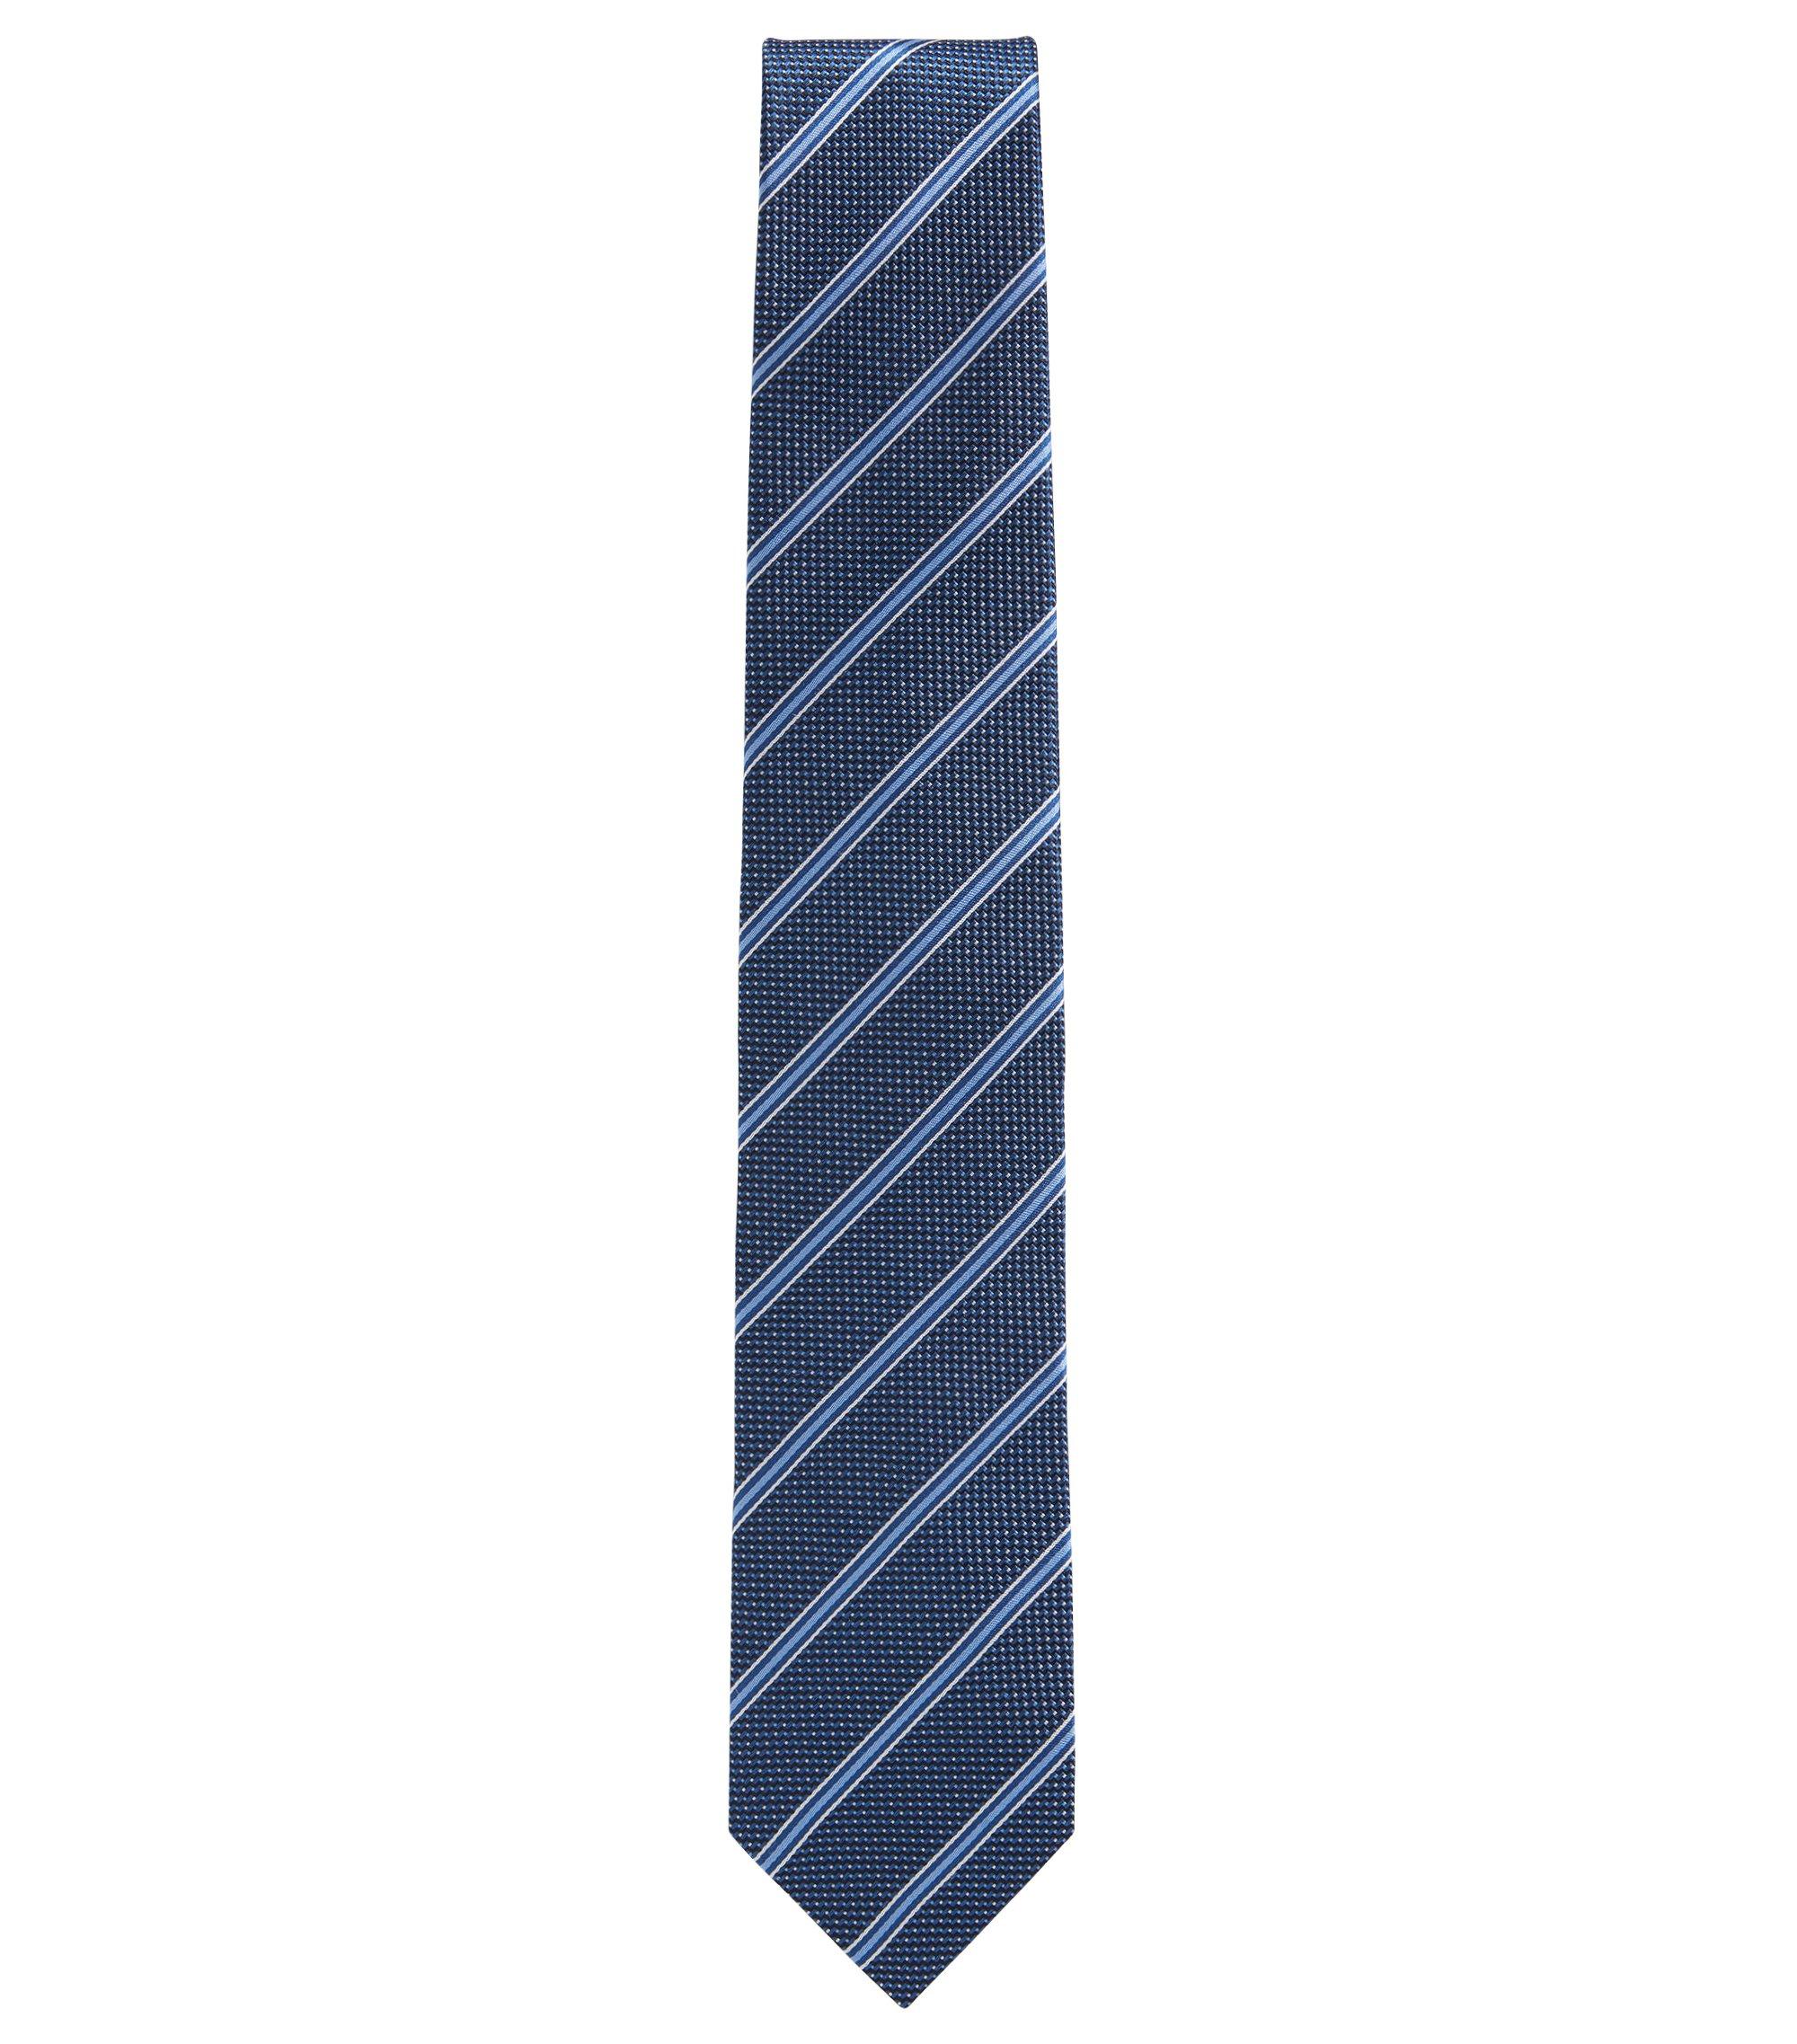 Gestreifte Krawatte aus gemustertem Seiden-Jacquard, Dunkelblau